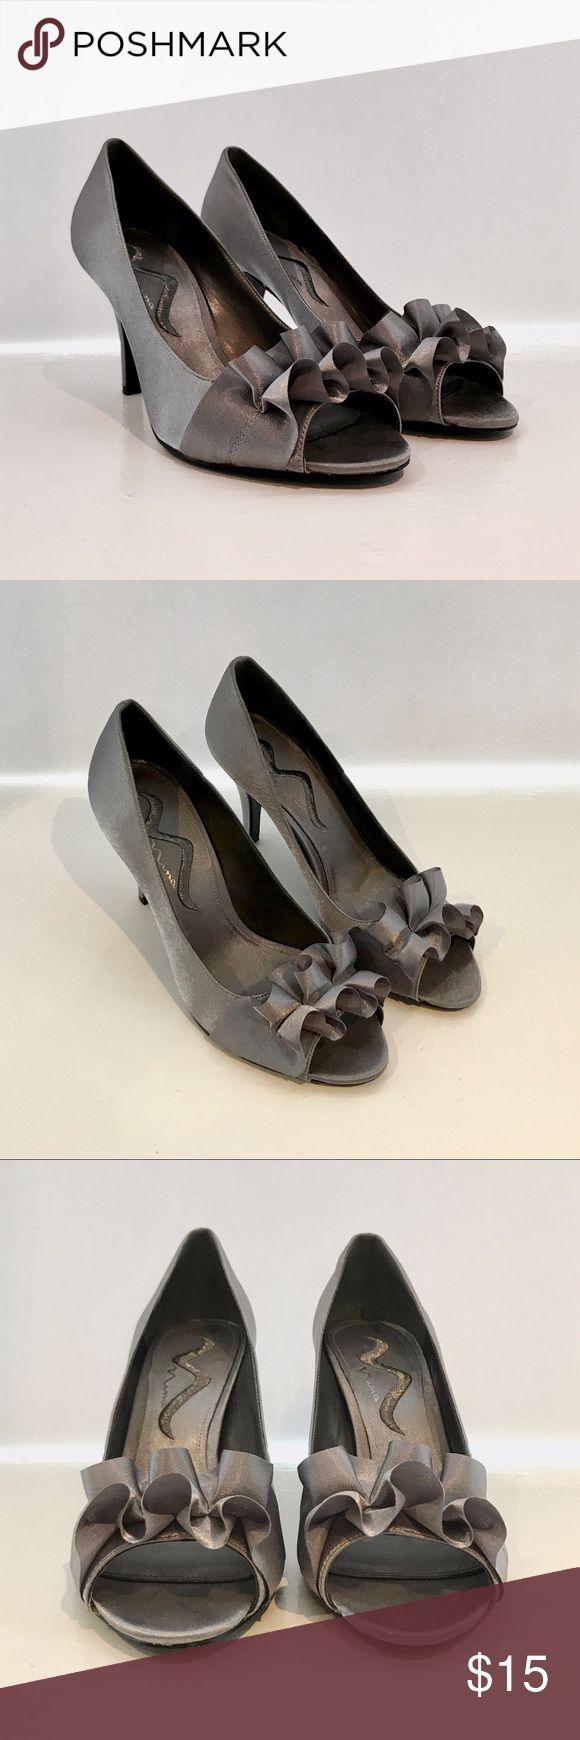 25 best ideas about Nina shoes on Pinterest